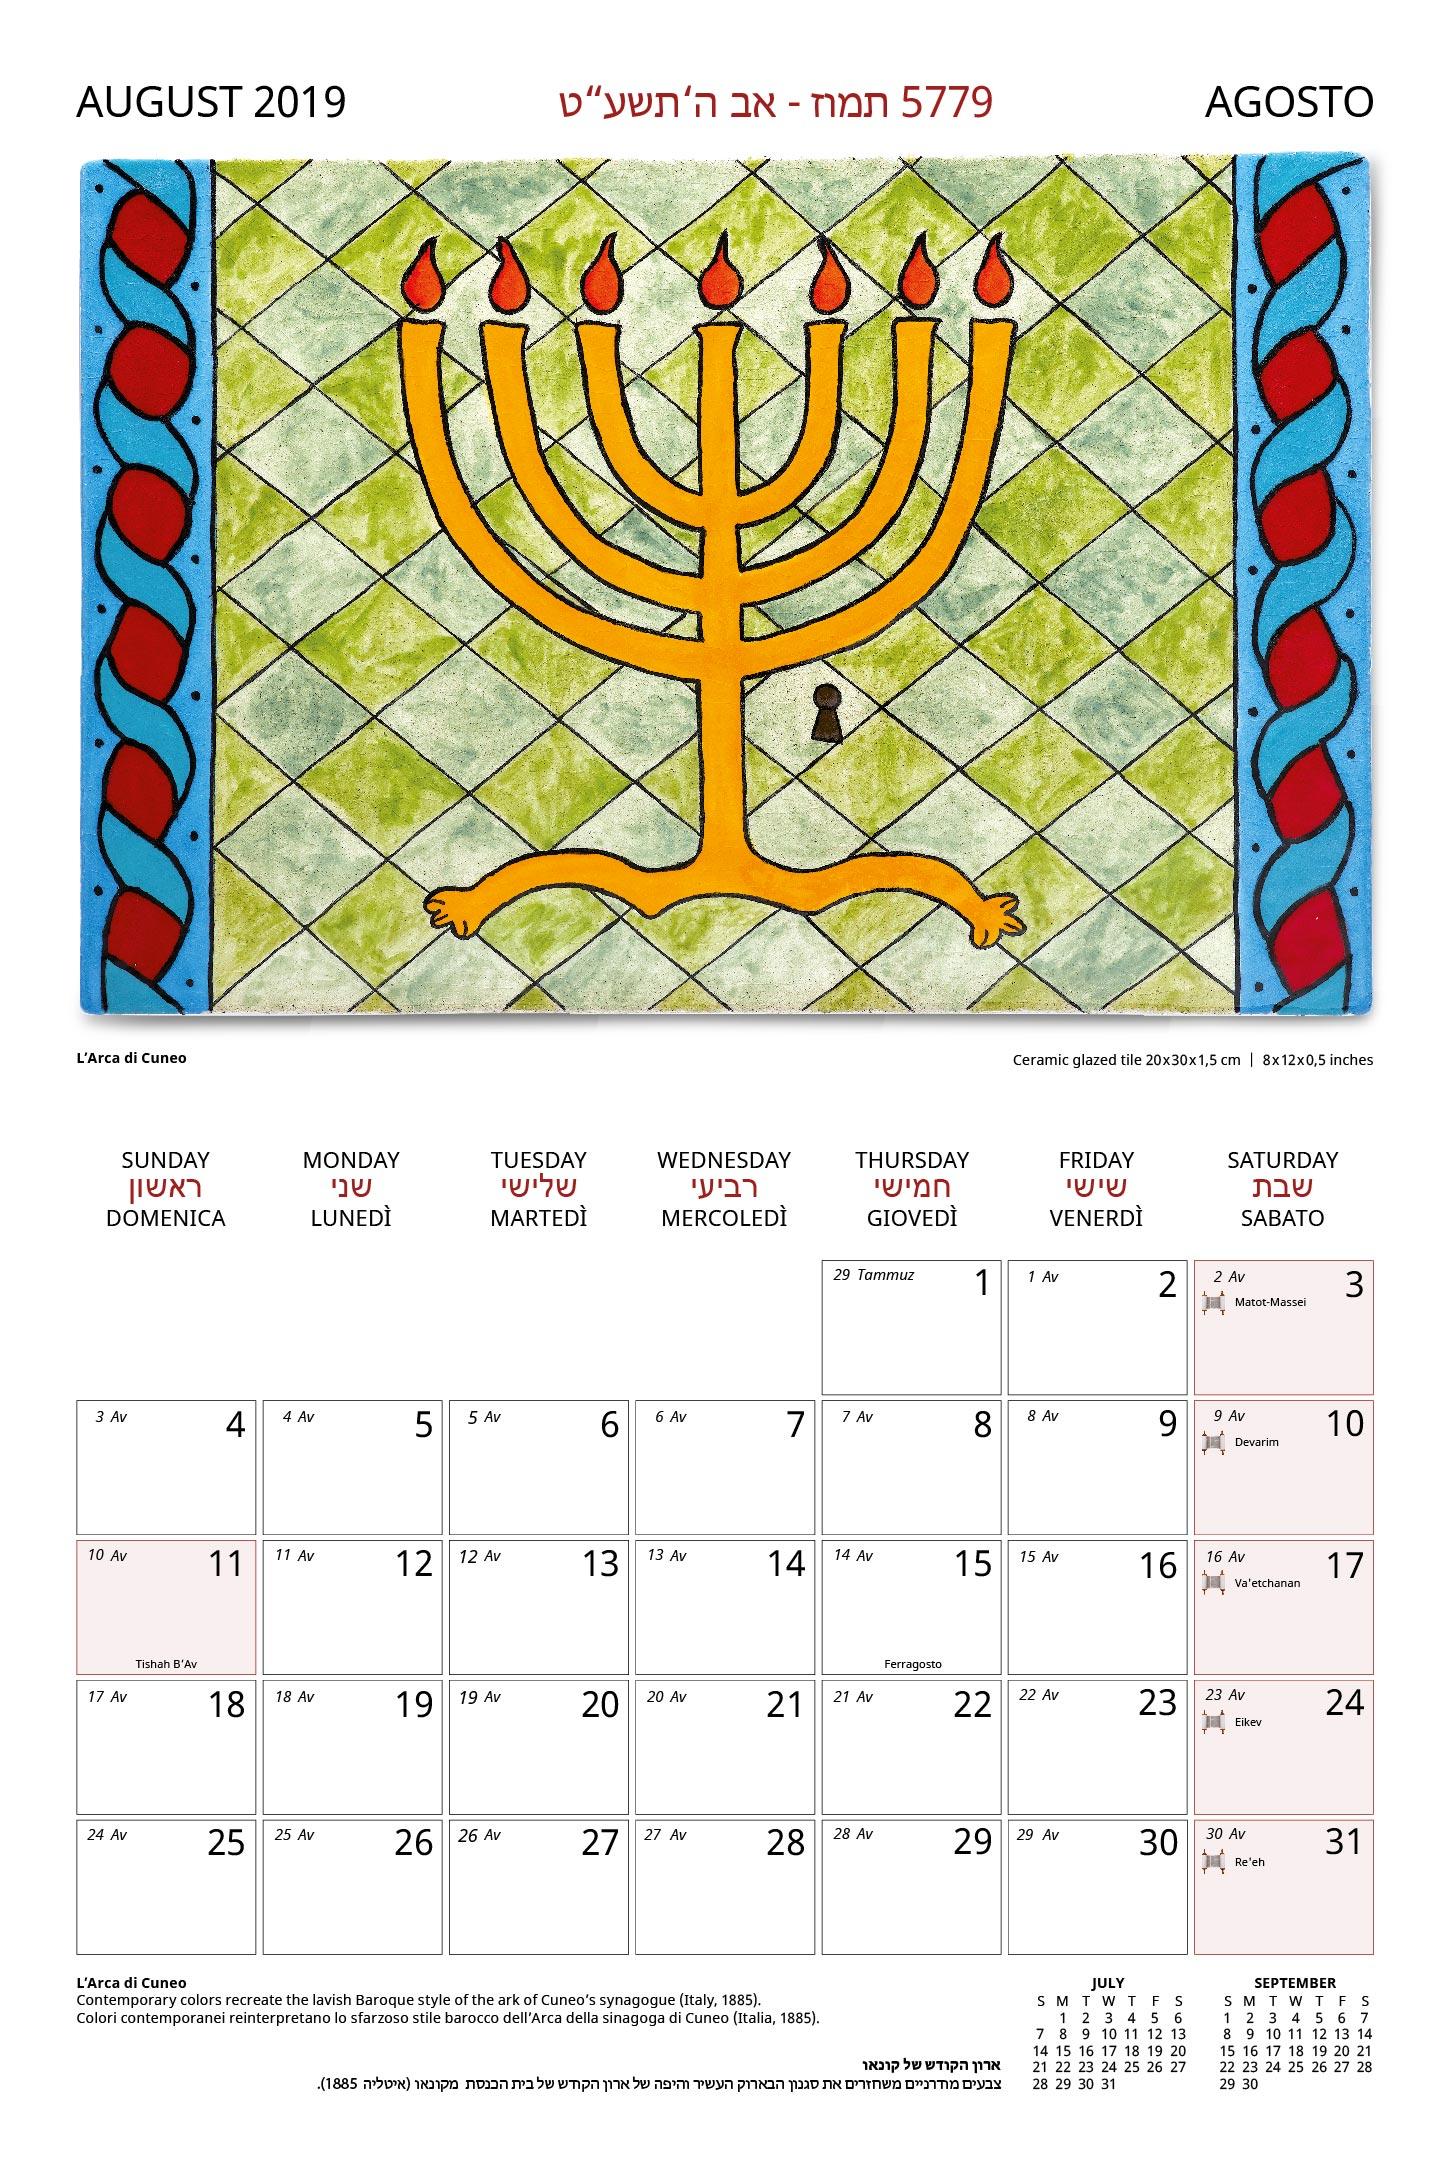 Calendario Ebreo.Jewish Art Calendar Calendario Ebraico D Arte Itman Joel 06 2018 Hoepli It